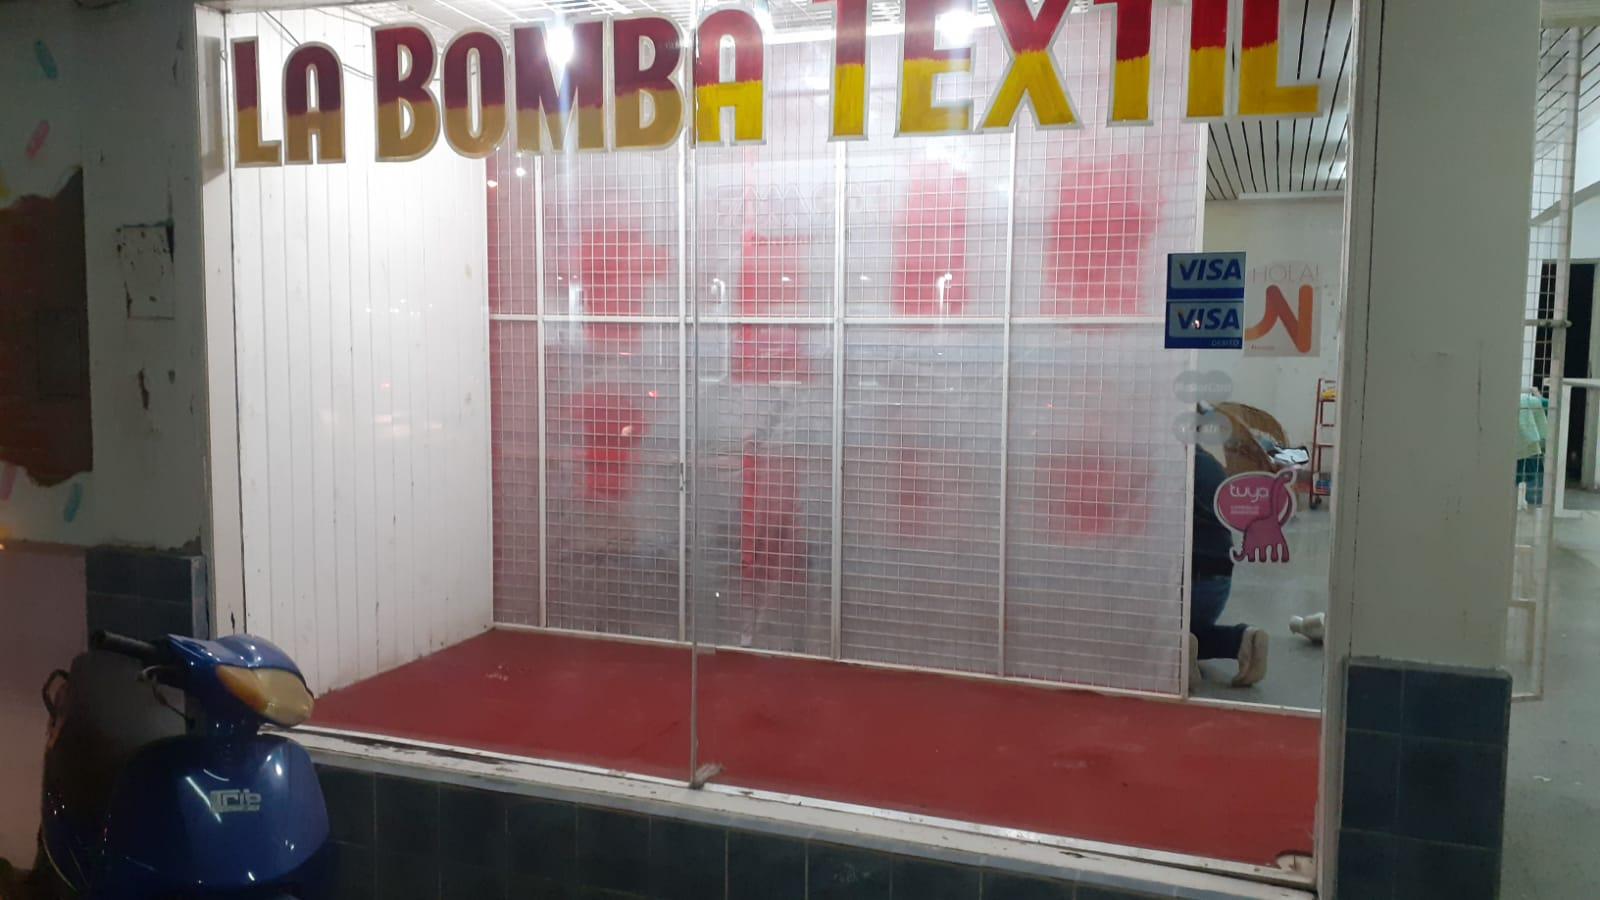 LA CRISIS HIZO CERRAR LAS PUERTAS DE LA BOMBA TEXTIL